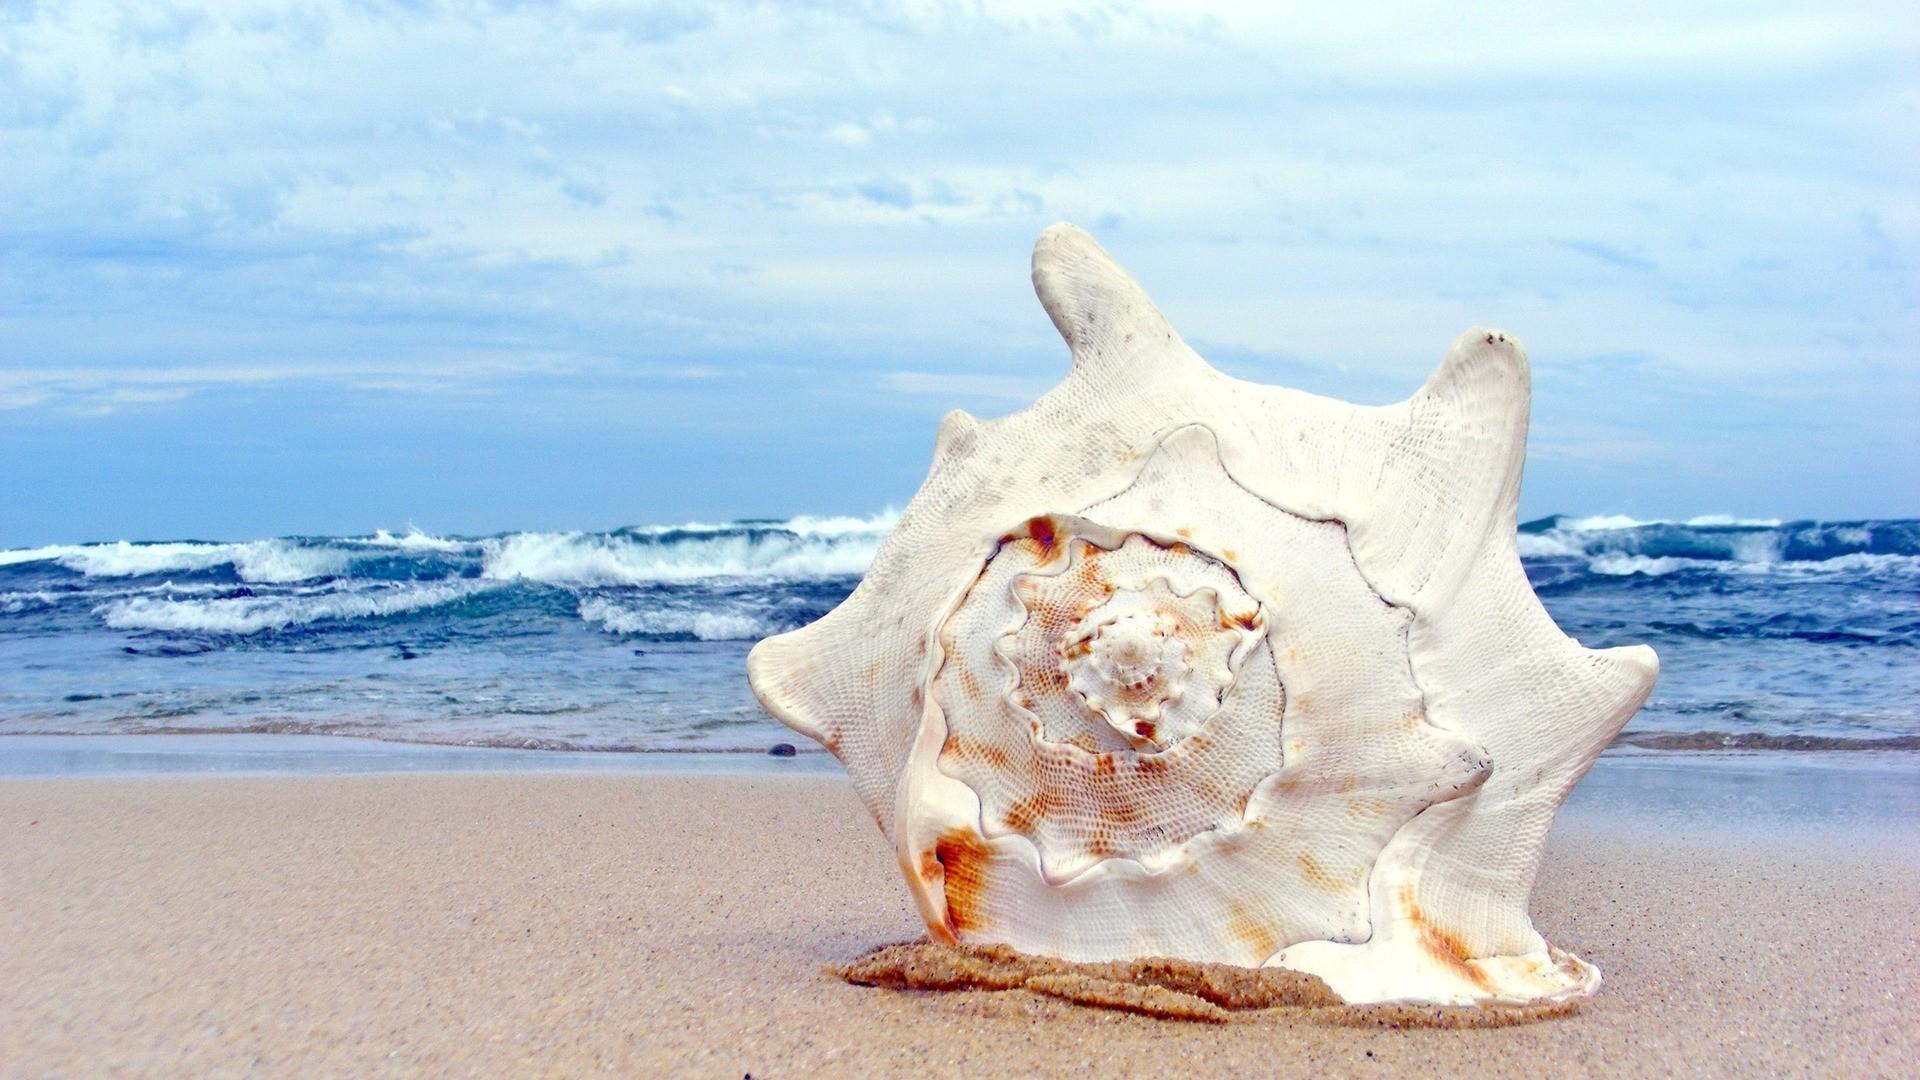 Seashell HD Wallpaper